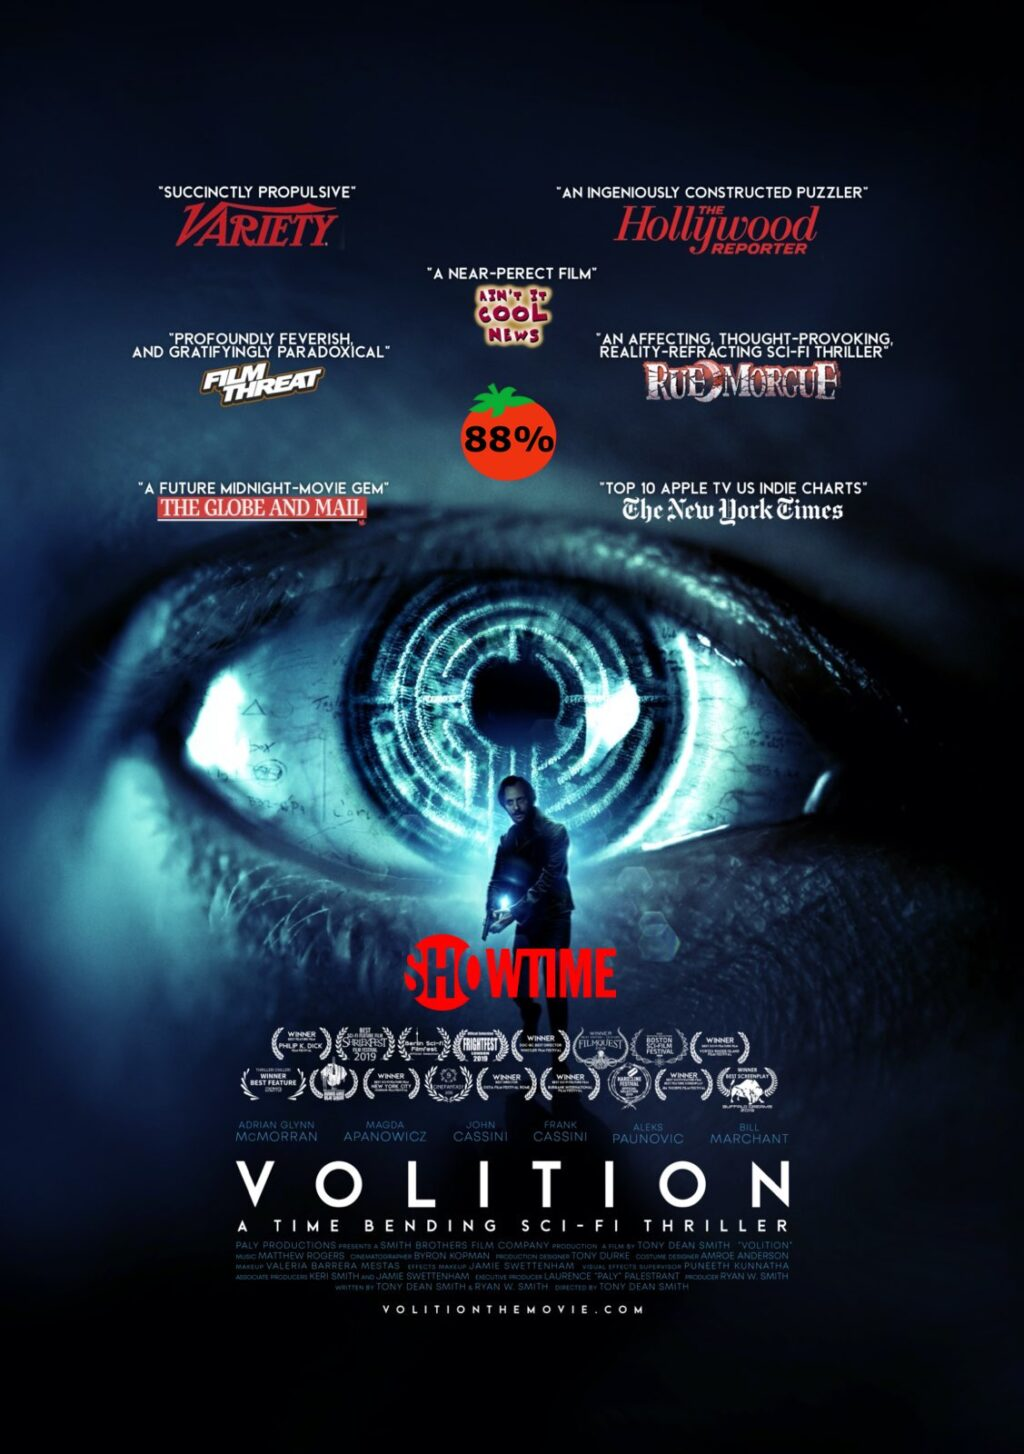 Volition_Vertical-Poster_Showtime